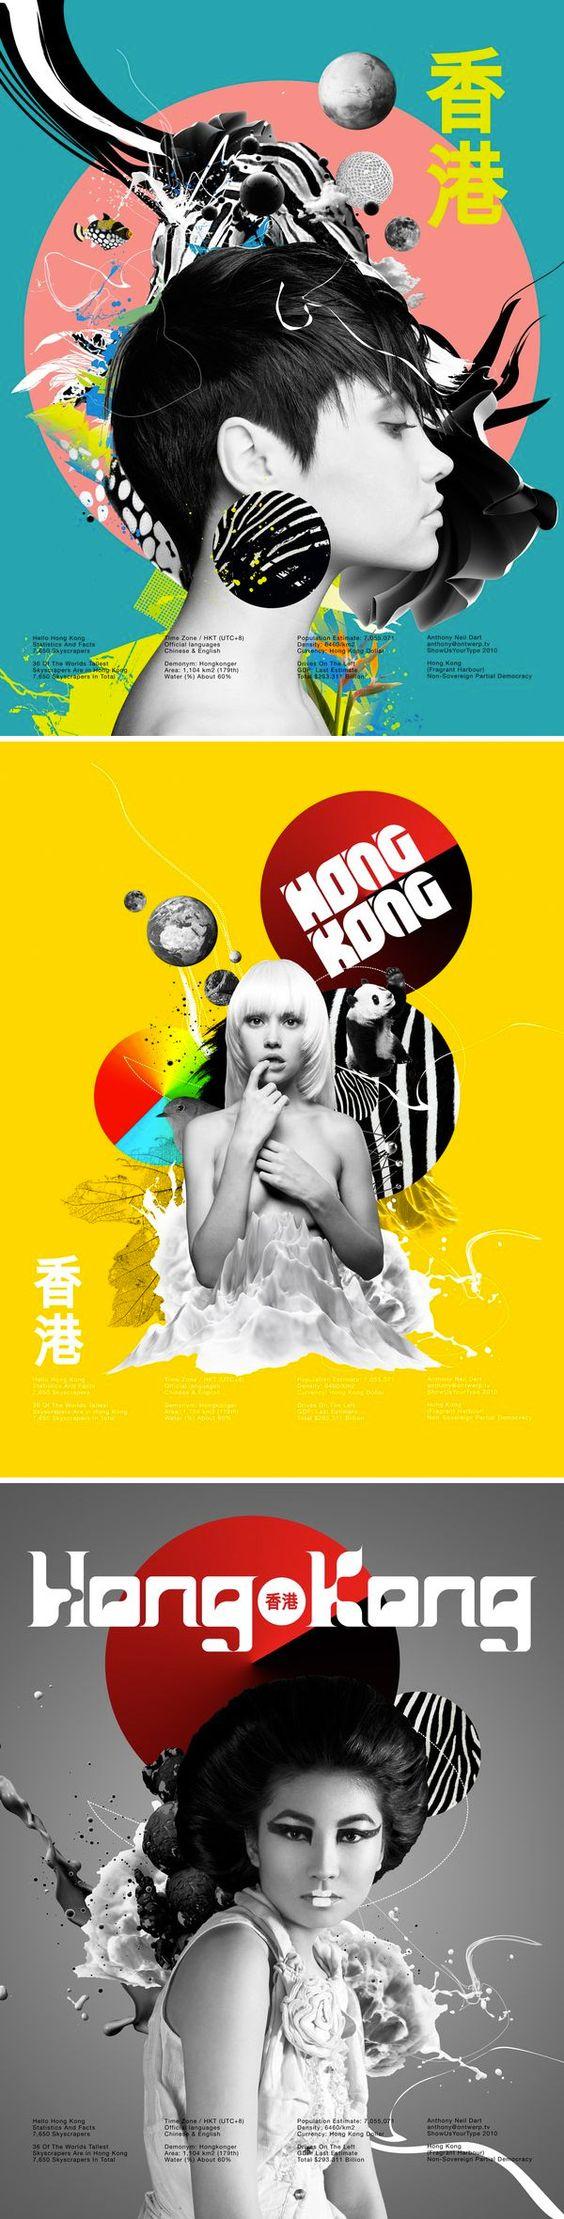 Poster design hong kong - Poster Set Neue Hong Kong By Anthony Neil Dart